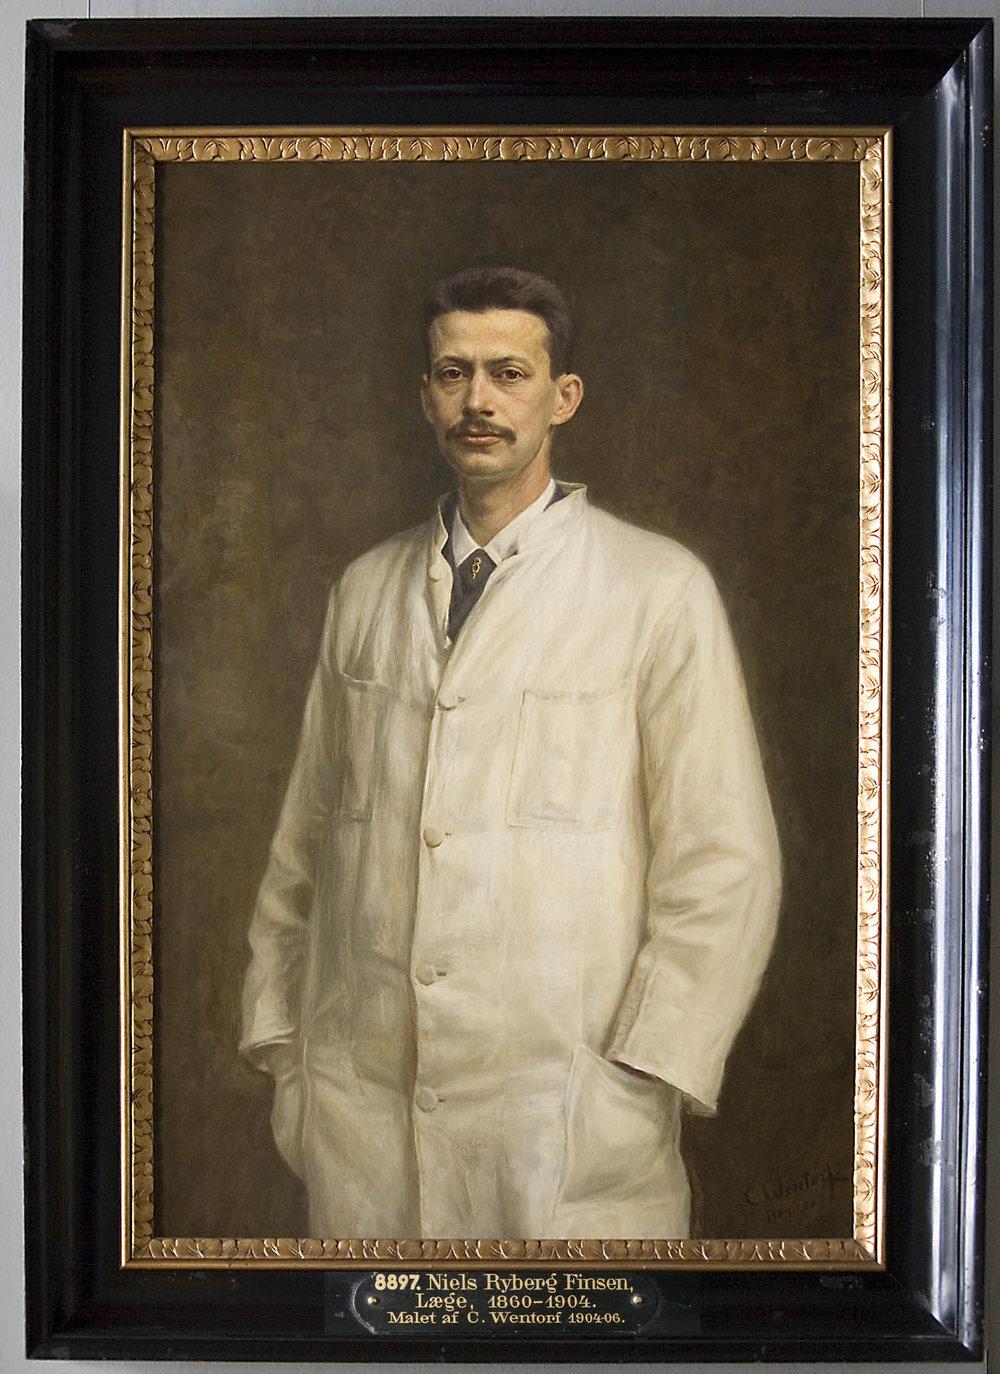 Figure 1  - Niels Finsen was awarded the 1903 Nobel Prize in Medicine.